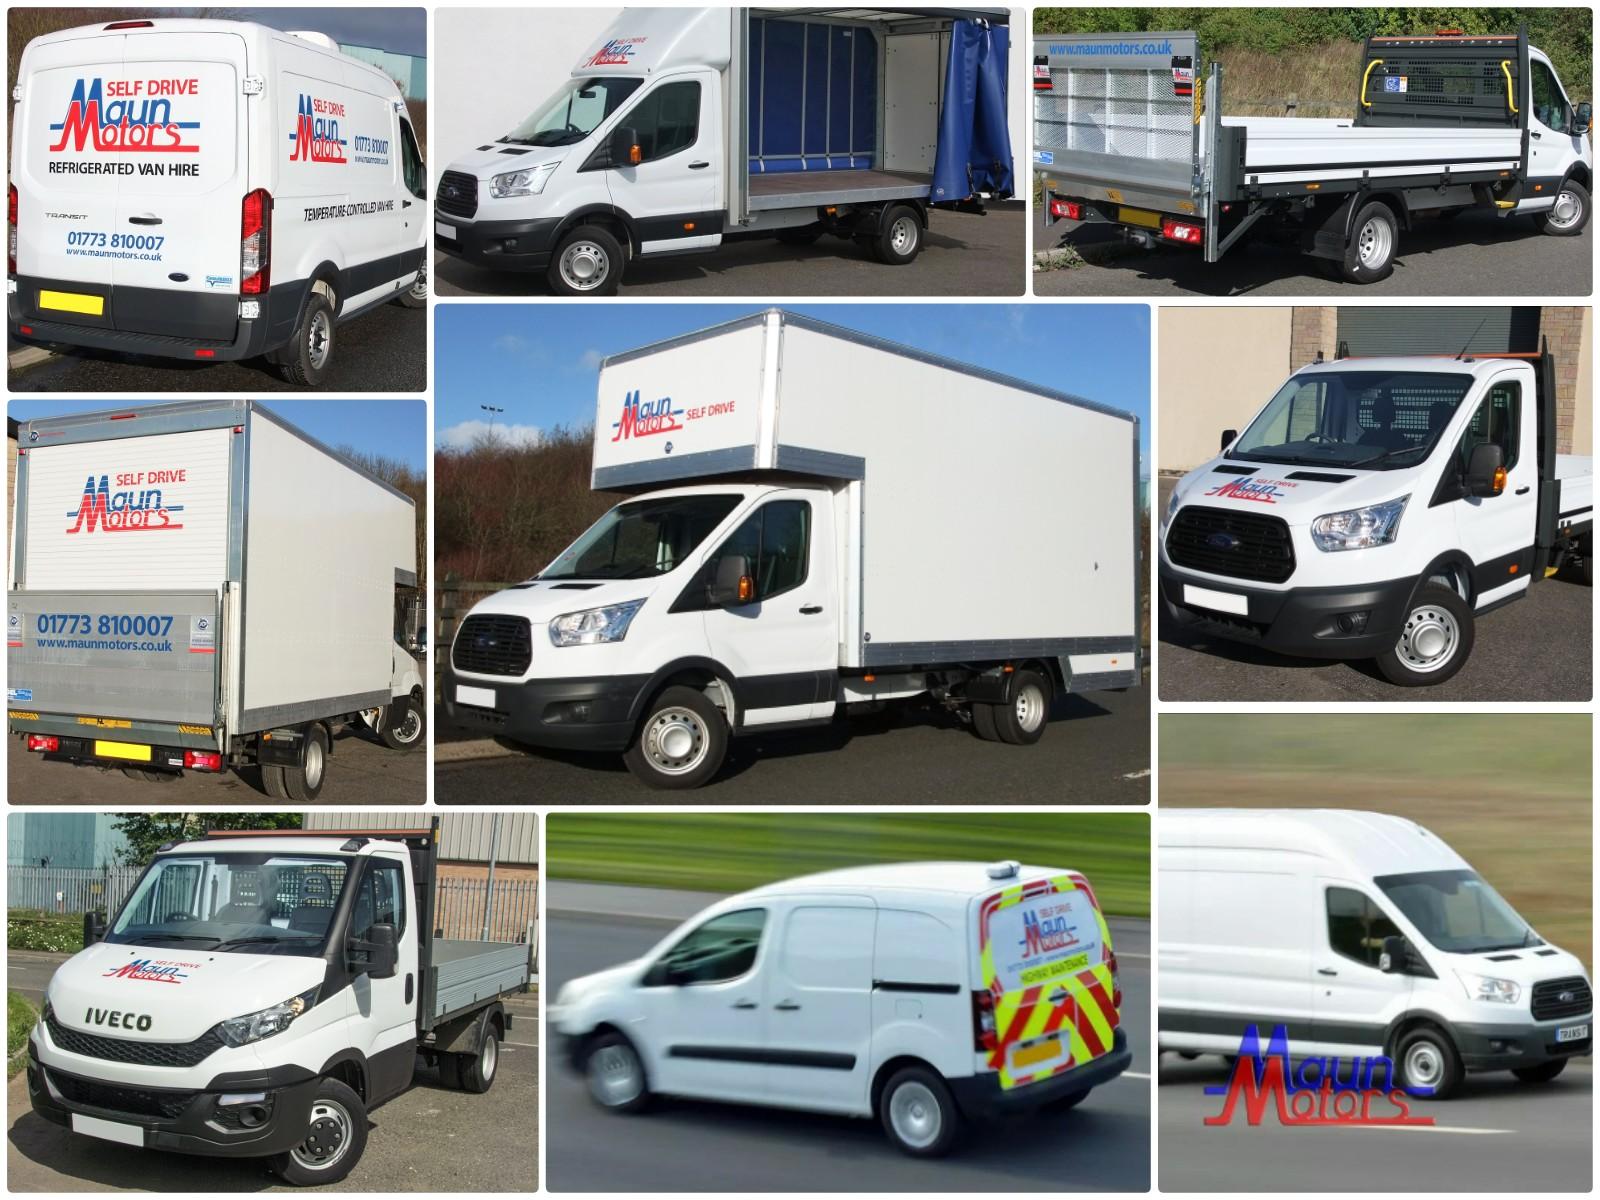 Van hire near me, from Maun Motors Self Drive